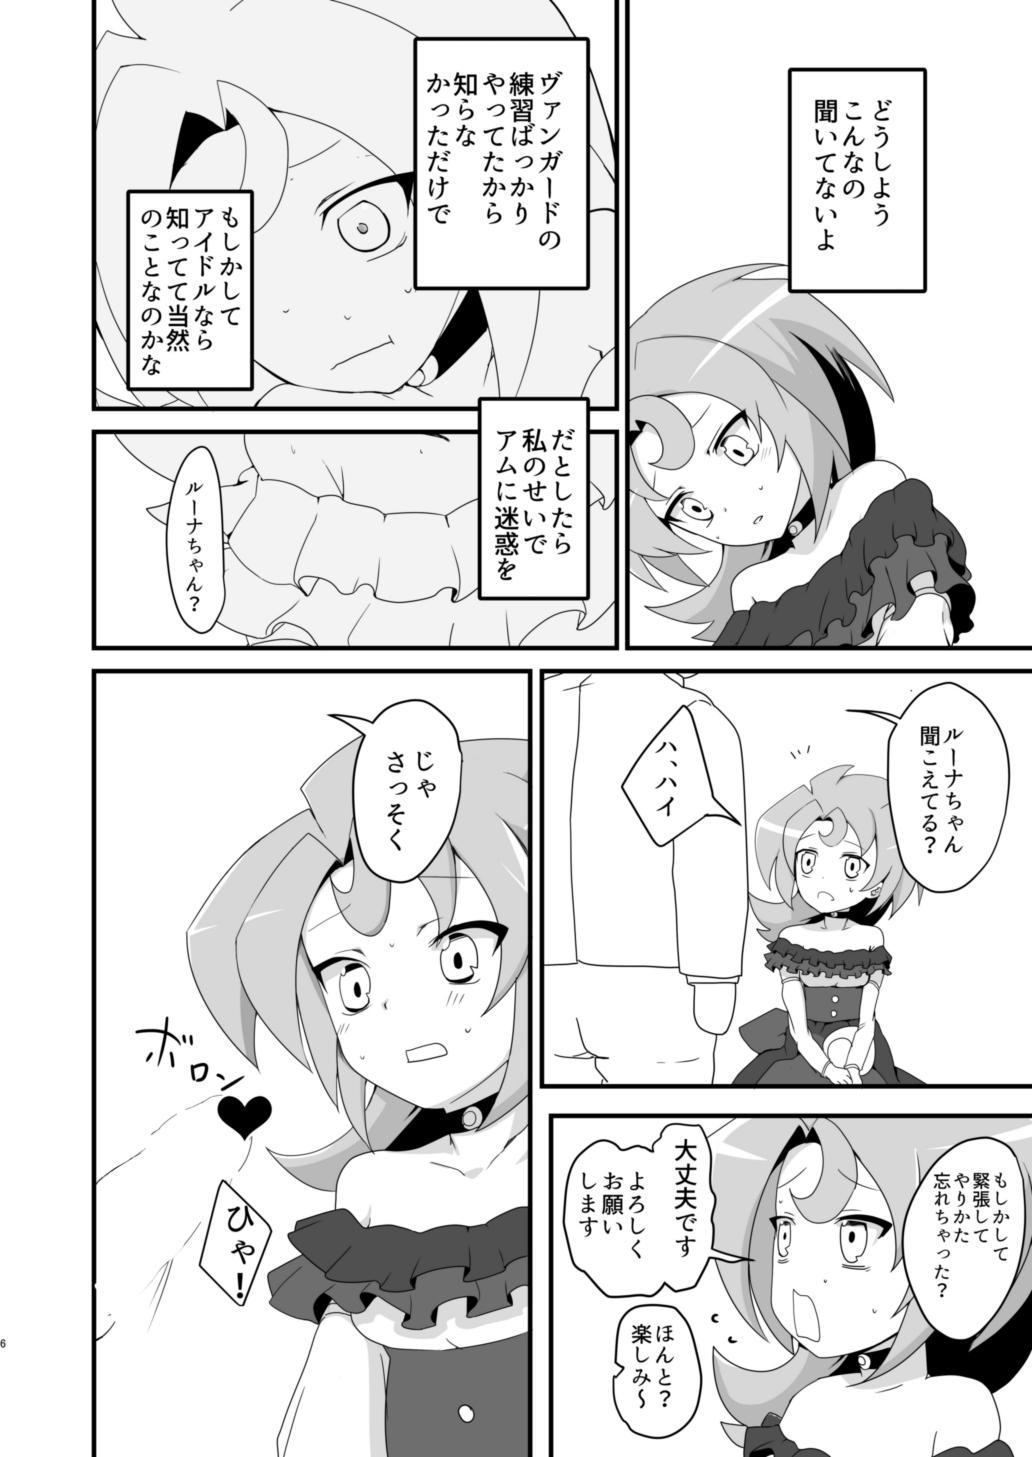 LunaAm O♂n♂n Akushuukai 4